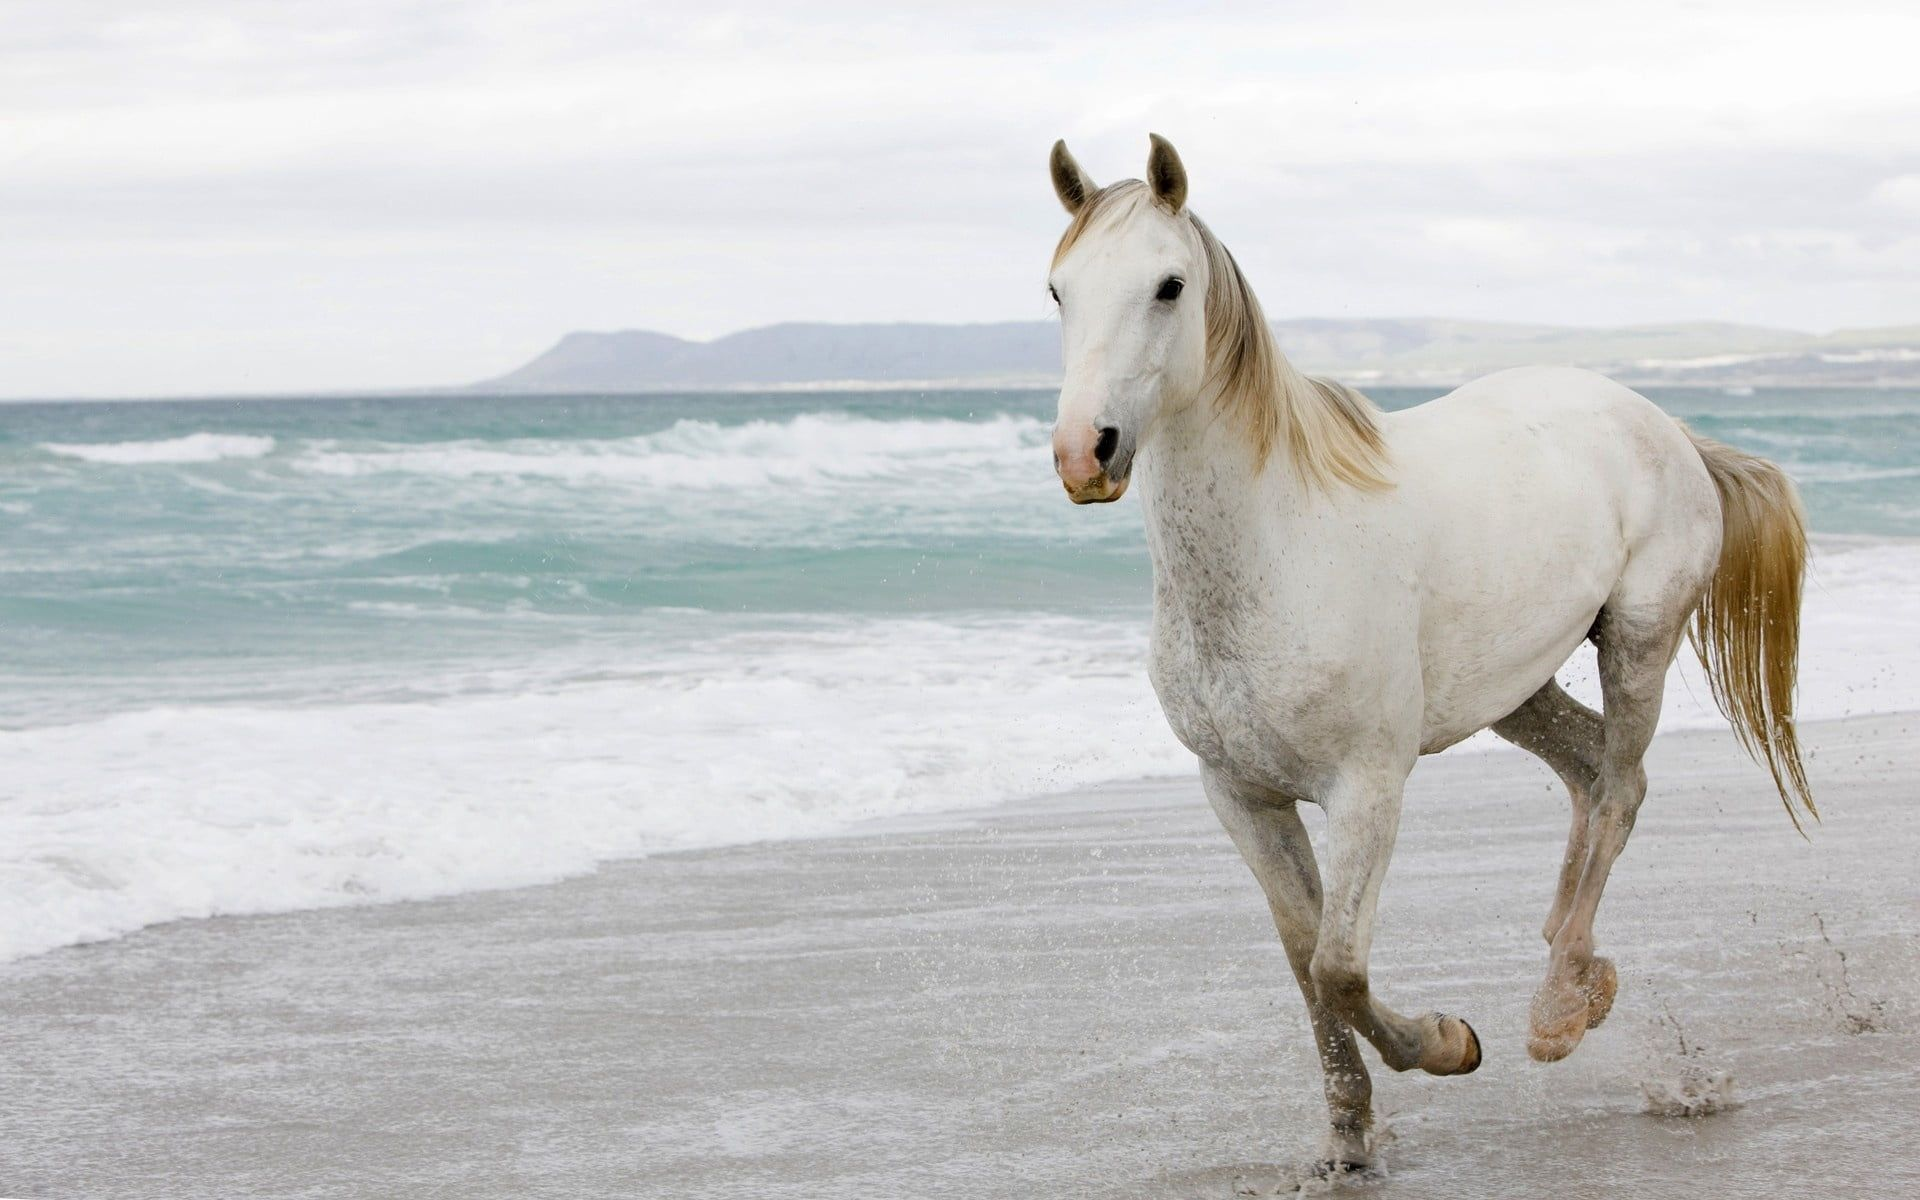 White And Brown Horse White Horse Sand Sea Escape 1080p Wallpaper Hdwallpaper Desktop Horse Wallpaper Horses Horse Photos